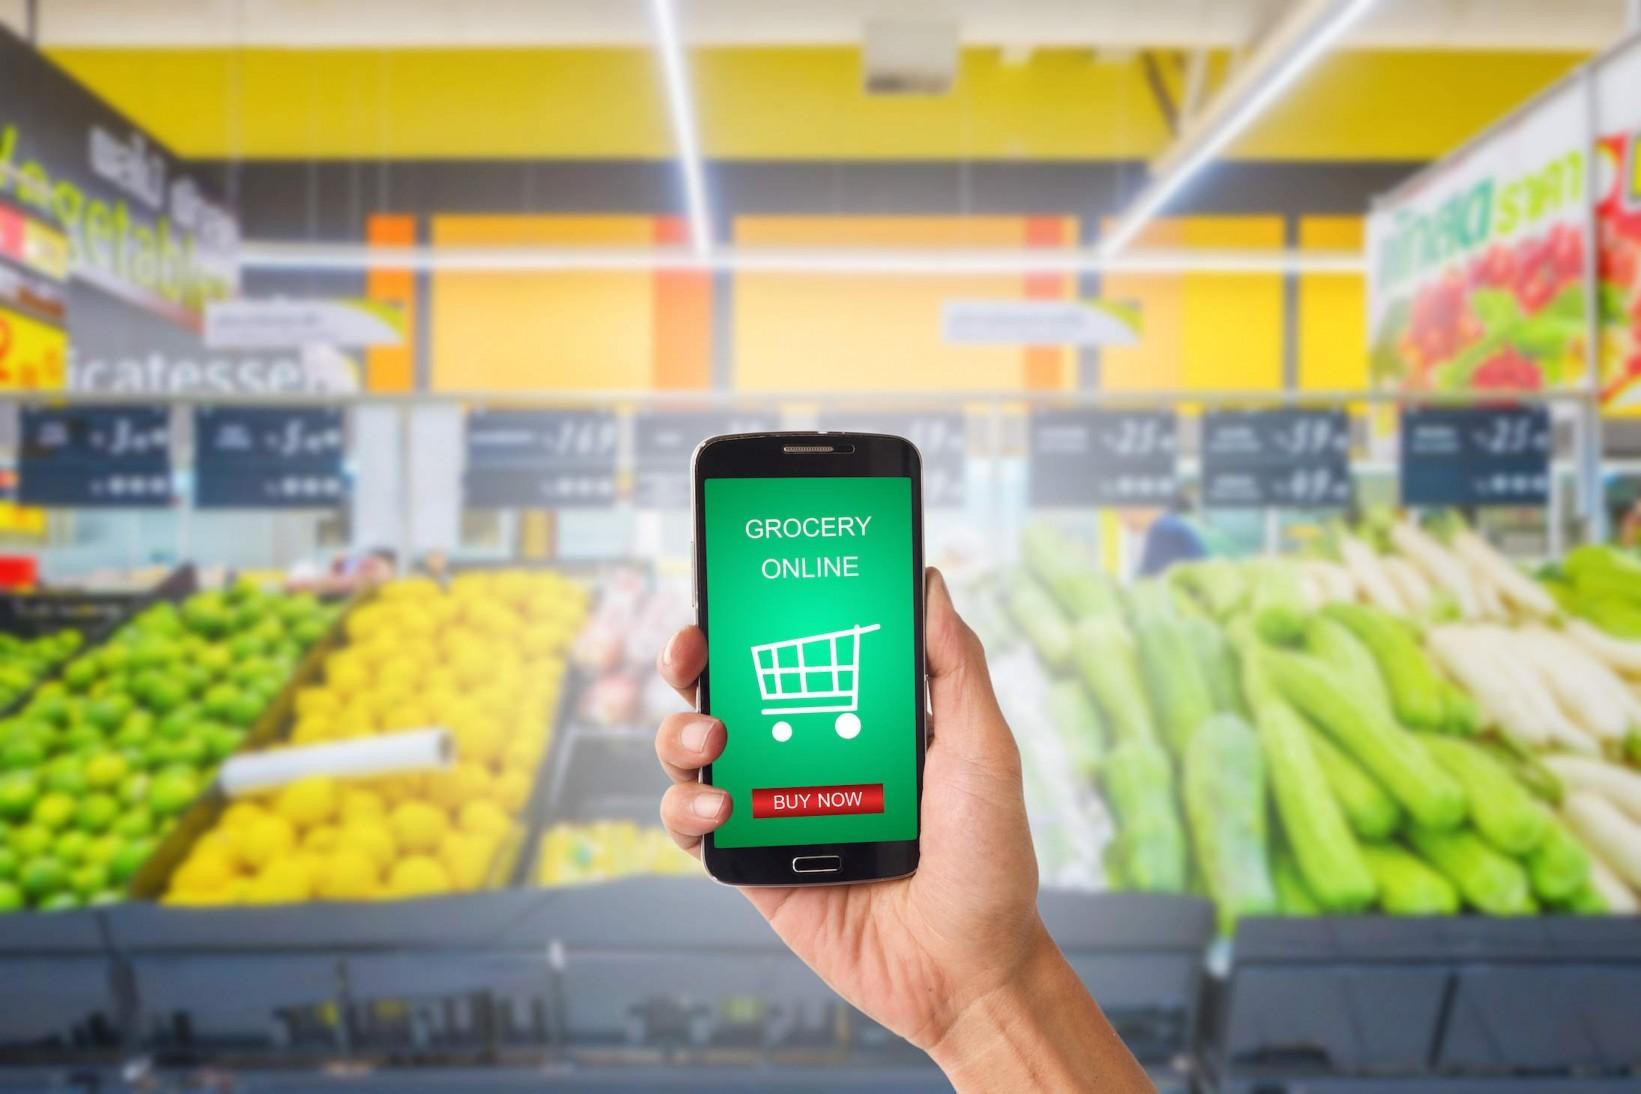 https://hkbonlinestore.files.wordpress.com/2020/09/online-grocery-shopping.jpg